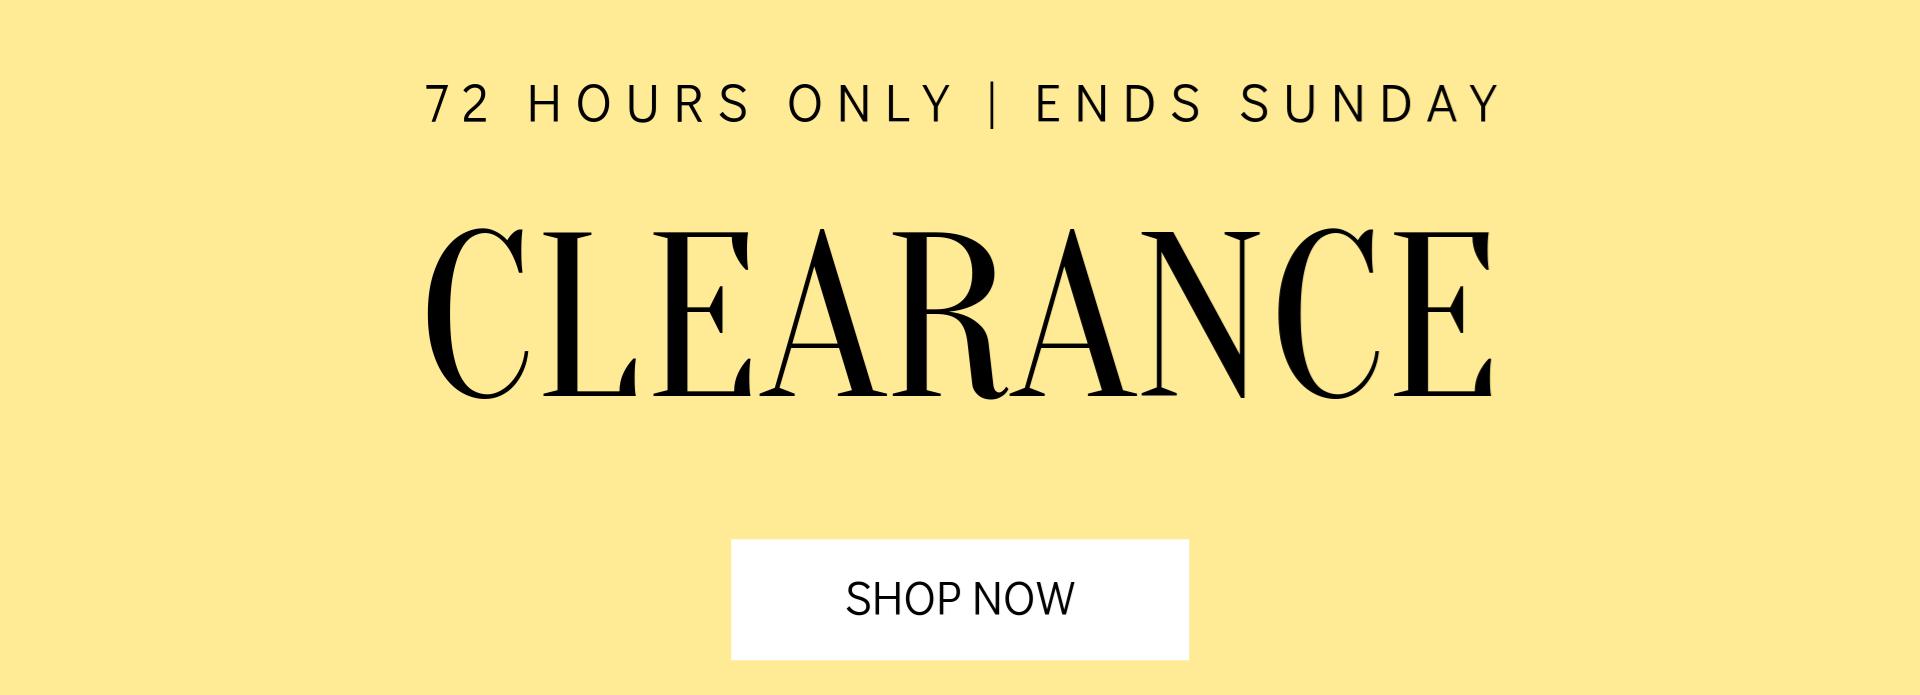 72 Hour Clearance Sale